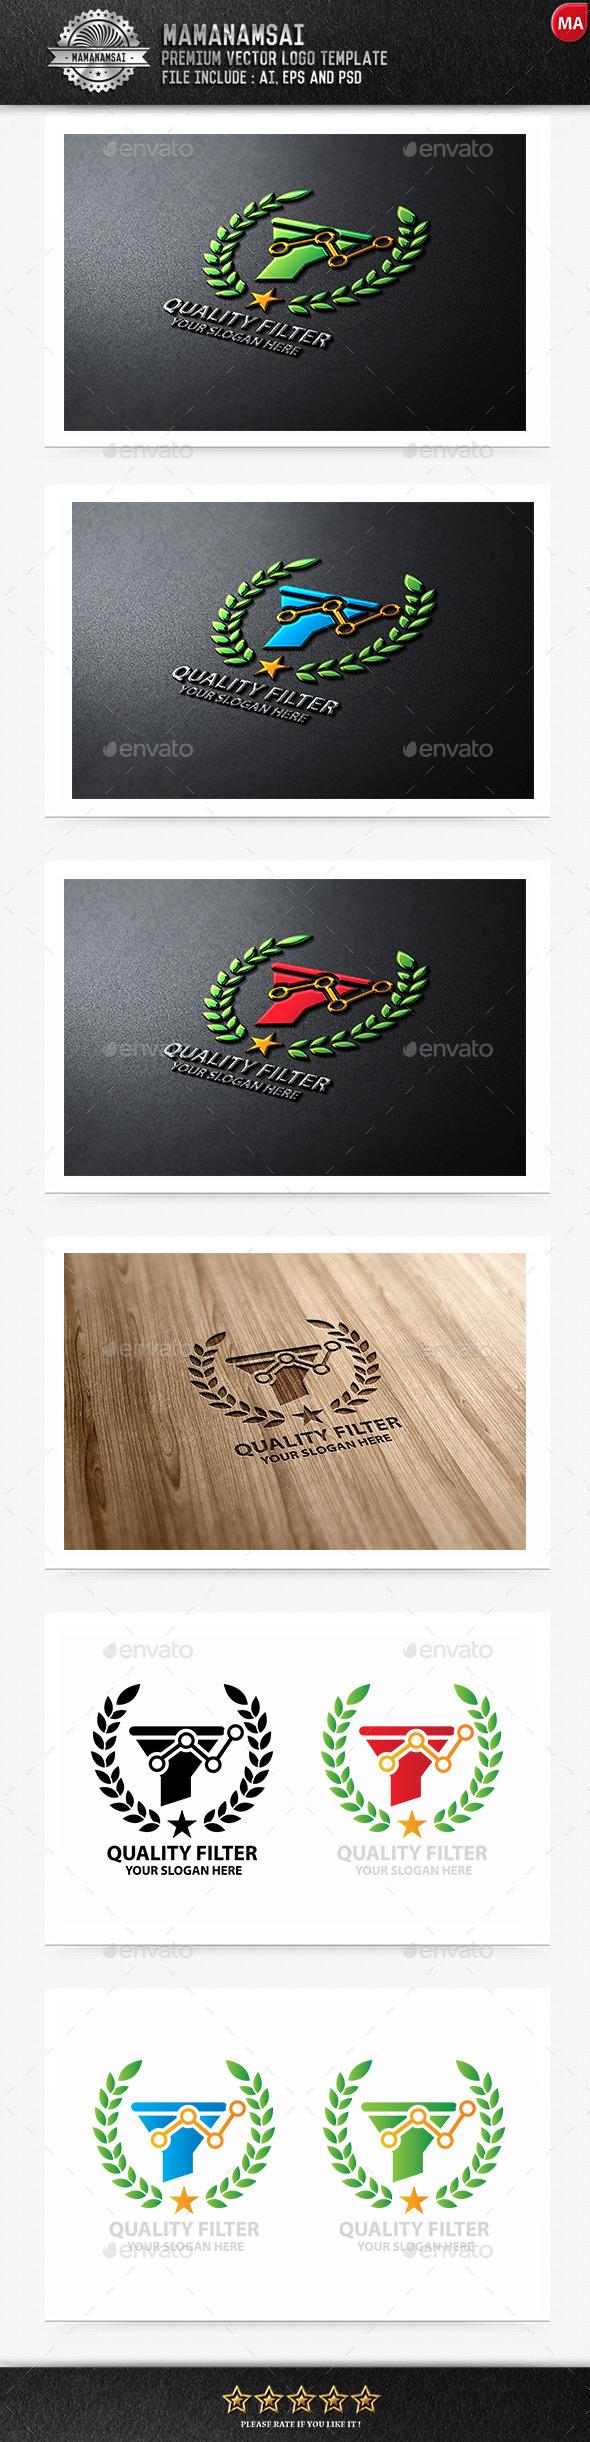 Quality Filter Logo - Logo Templates